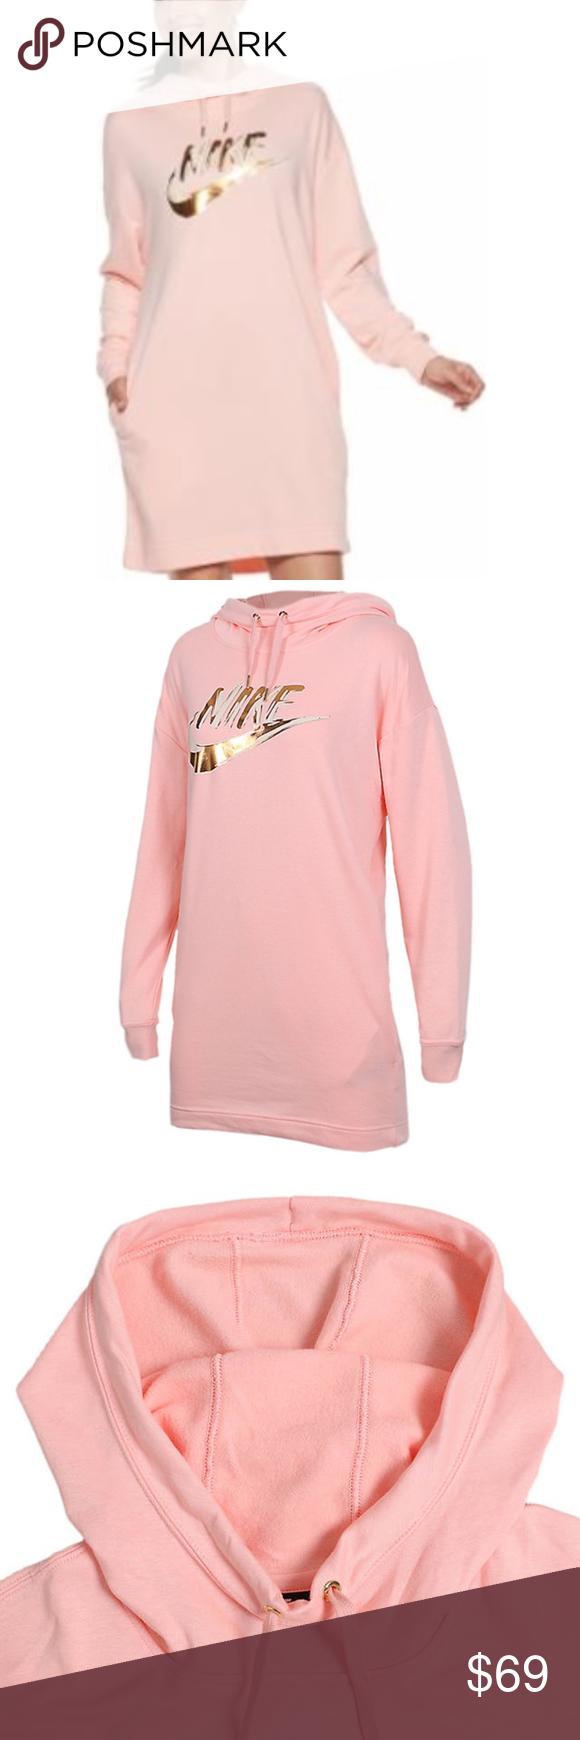 Nike Blush Pink Peach Metallic Hoodie Dress Xl Nike Dresses Hoodie Dress Metallic Dress [ 1740 x 580 Pixel ]